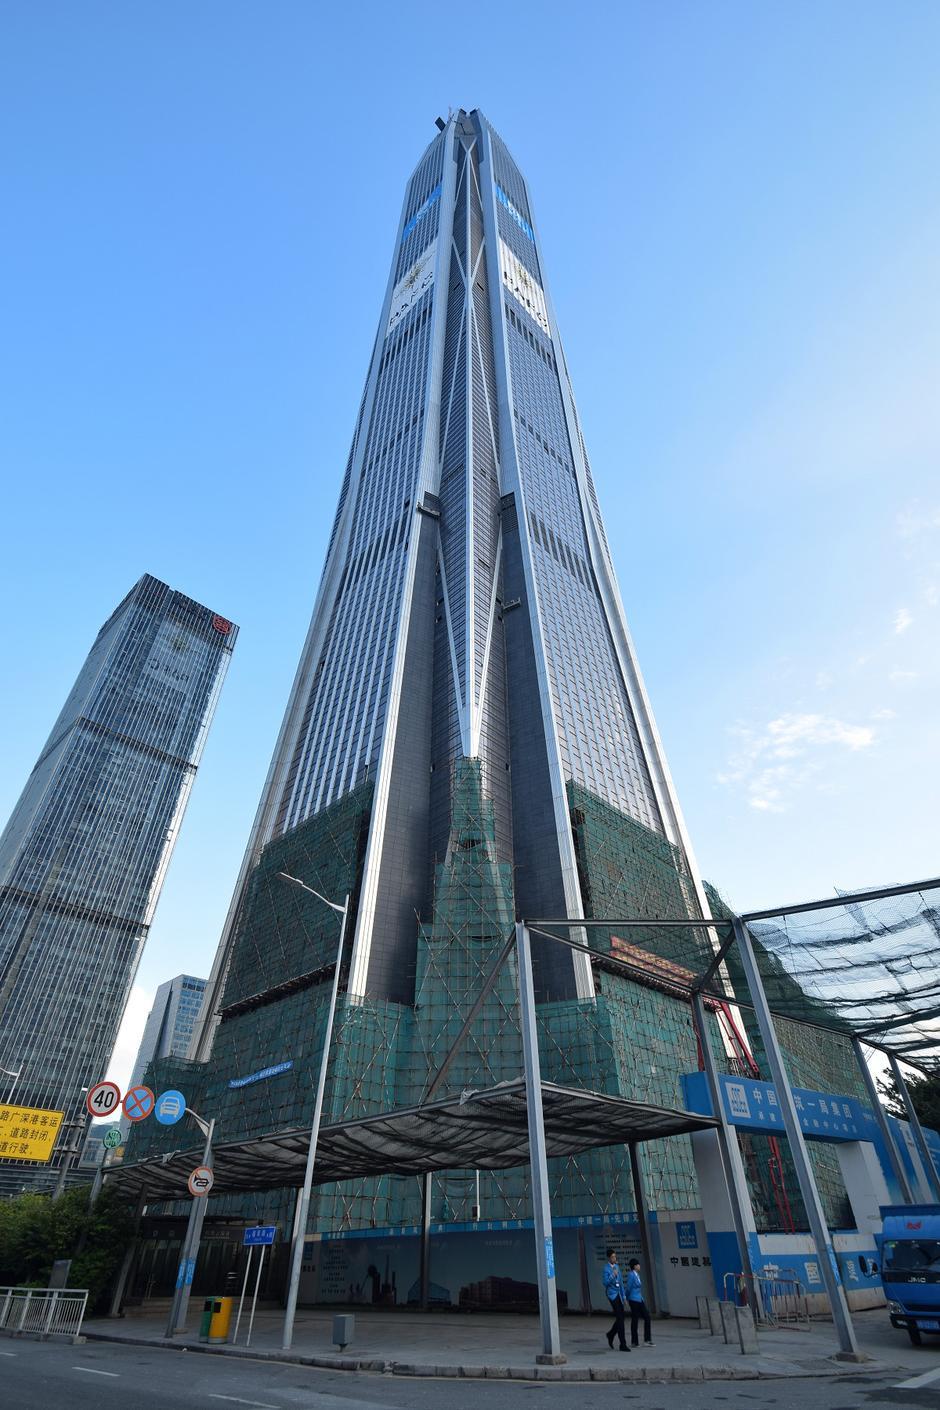 Financijski centar Ping u Shenzhenu | Author: Wikipedia